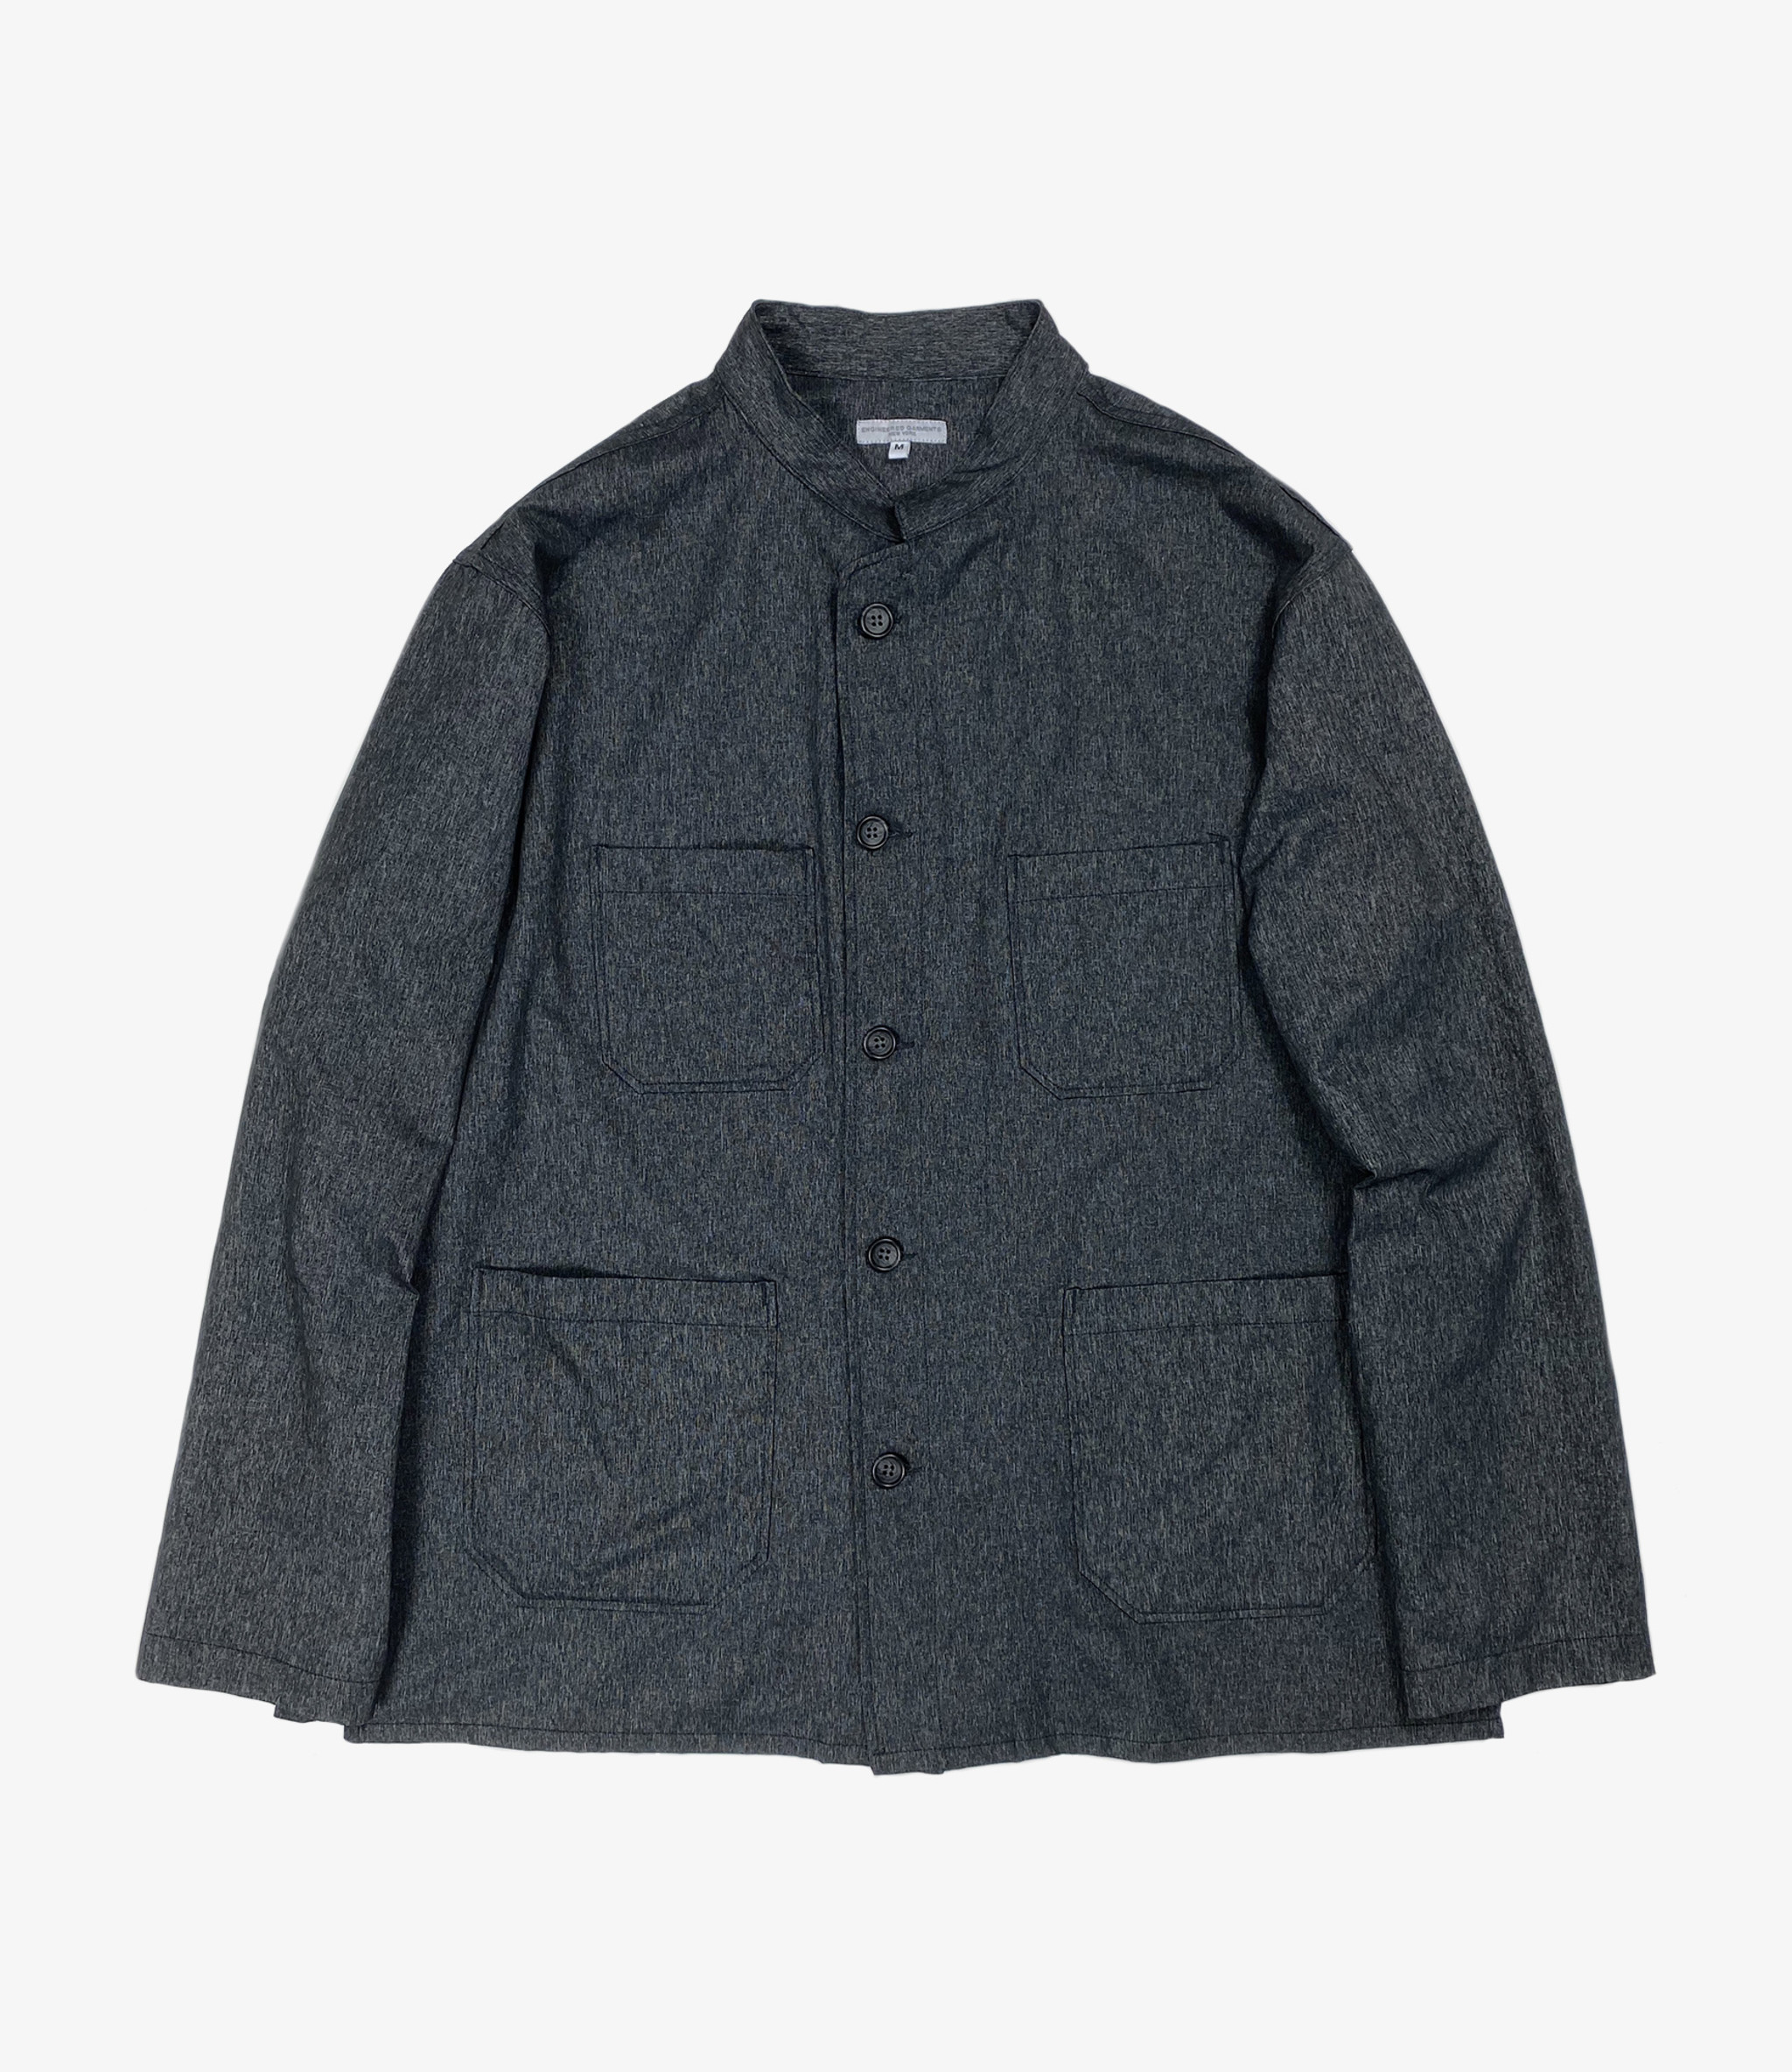 Engineered Garments Dayton Shirt - Heather Charcoal Polyester Microfiber